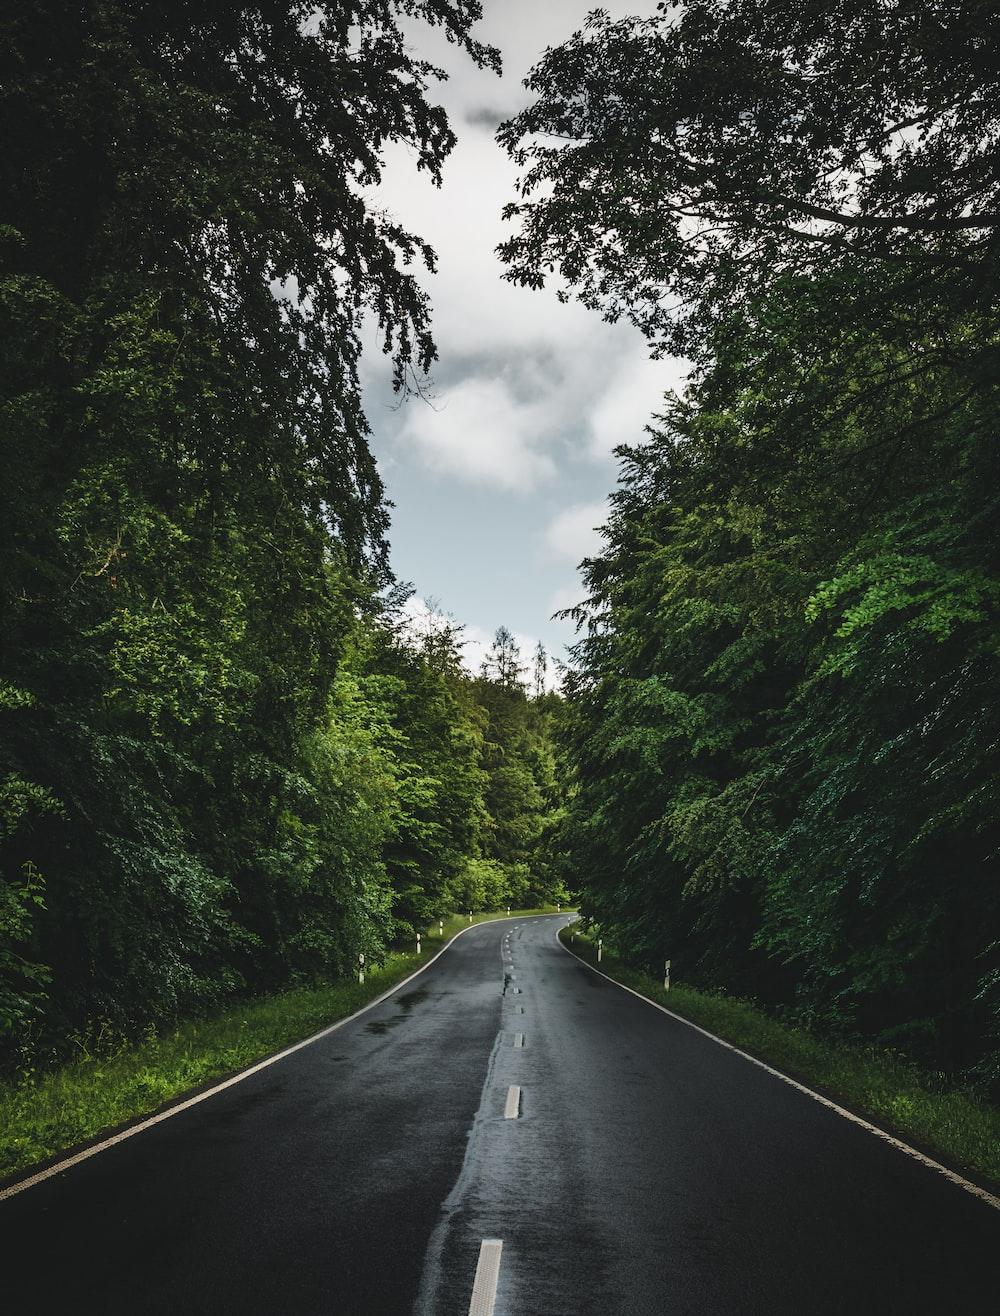 black asphalt road between green trees under white clouds during daytime